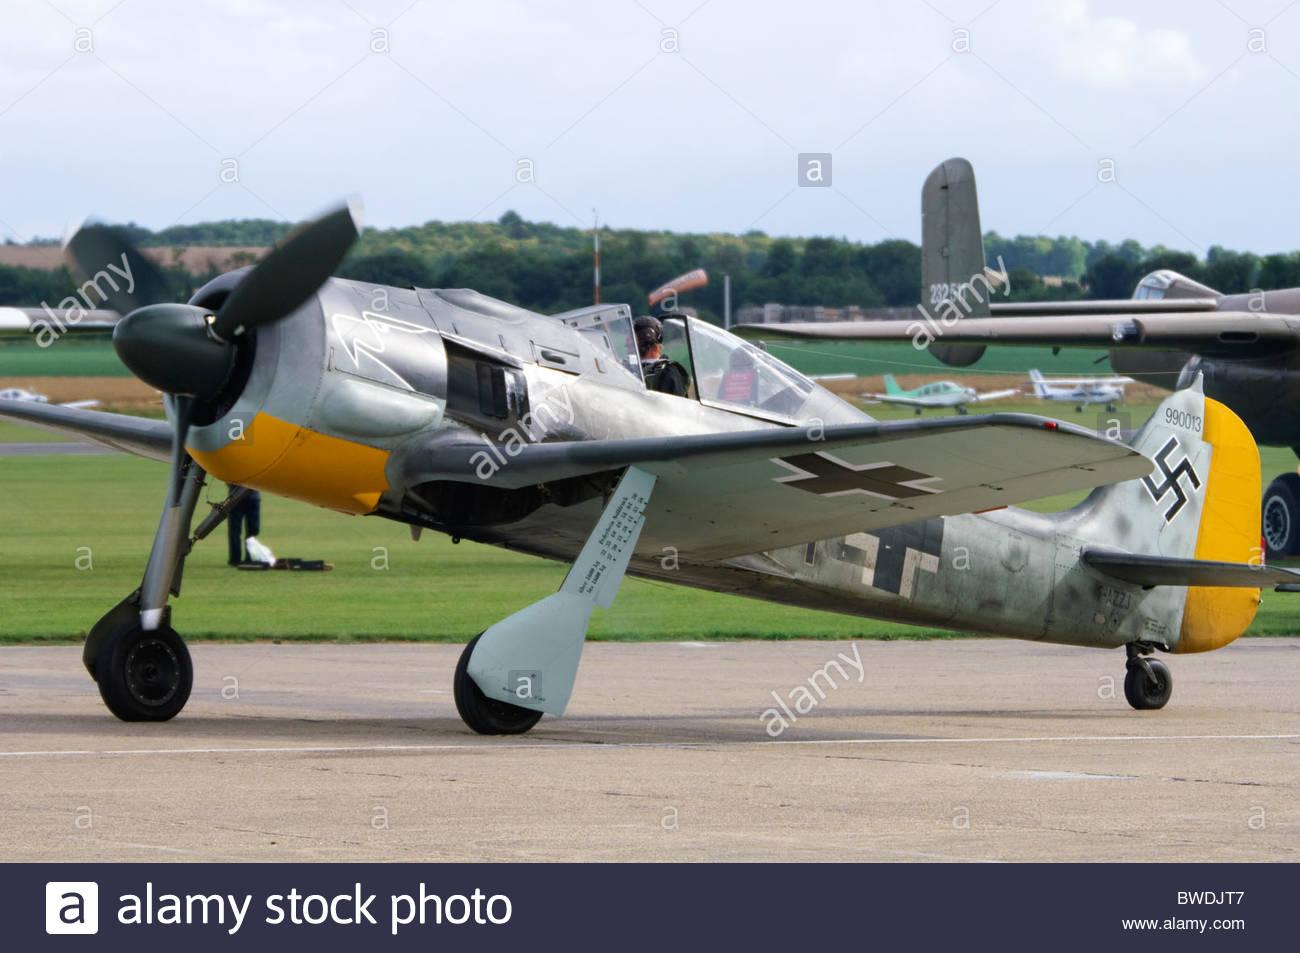 flugwerk-built-focke-wulf-fw-190-a8n-in-luftwaffe-colours-taxiing-BWDJT7.jpg